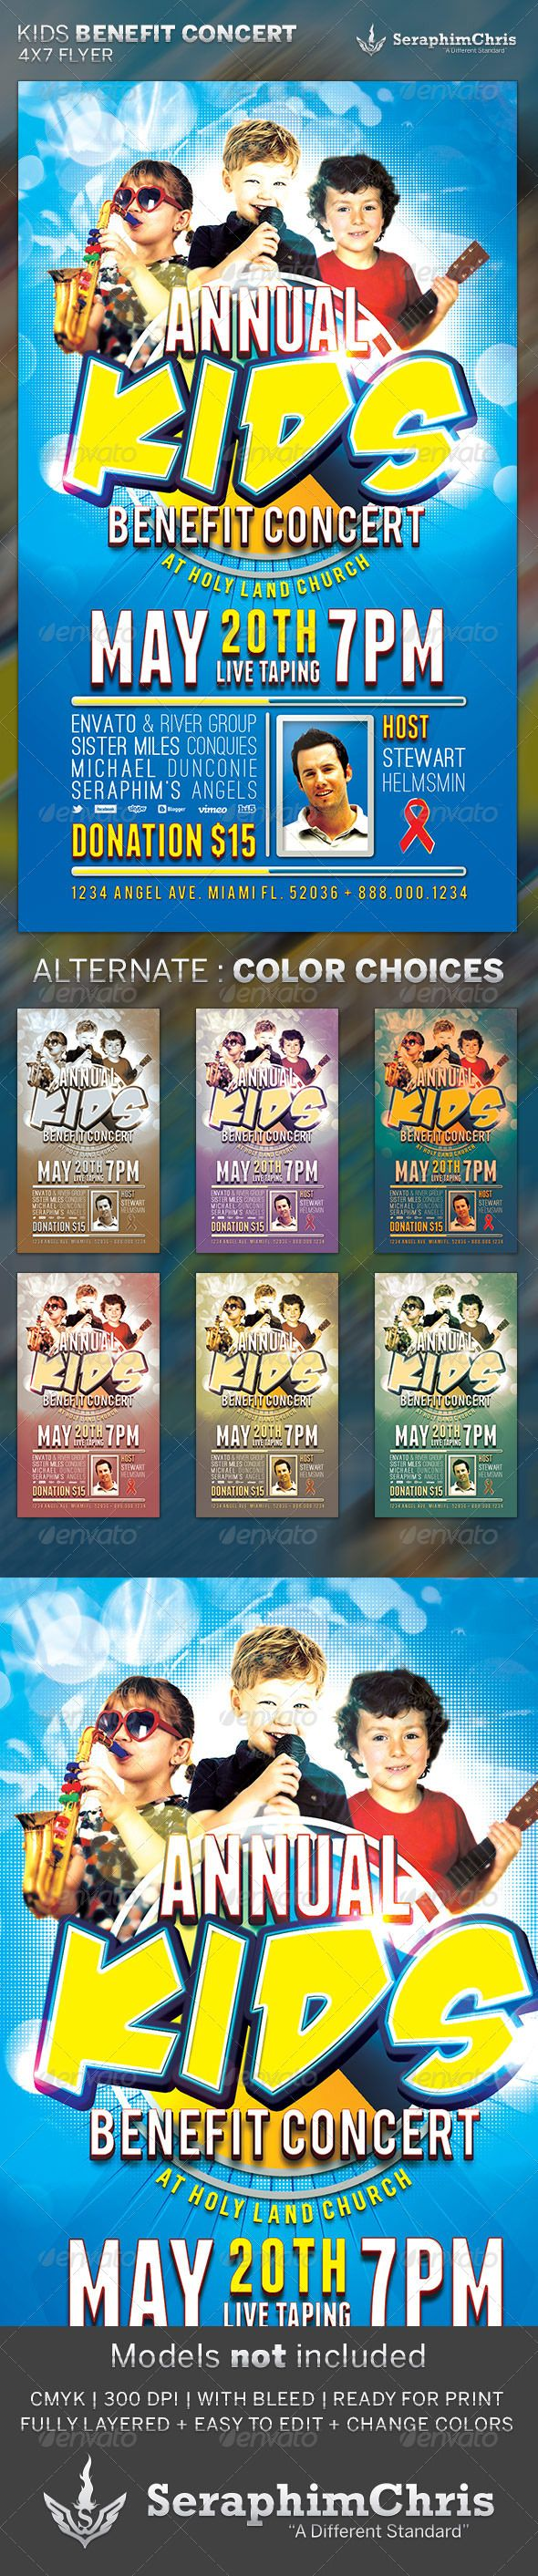 Kids Benefit Concert: Flyer Template   Pinterest   Concert flyer ...